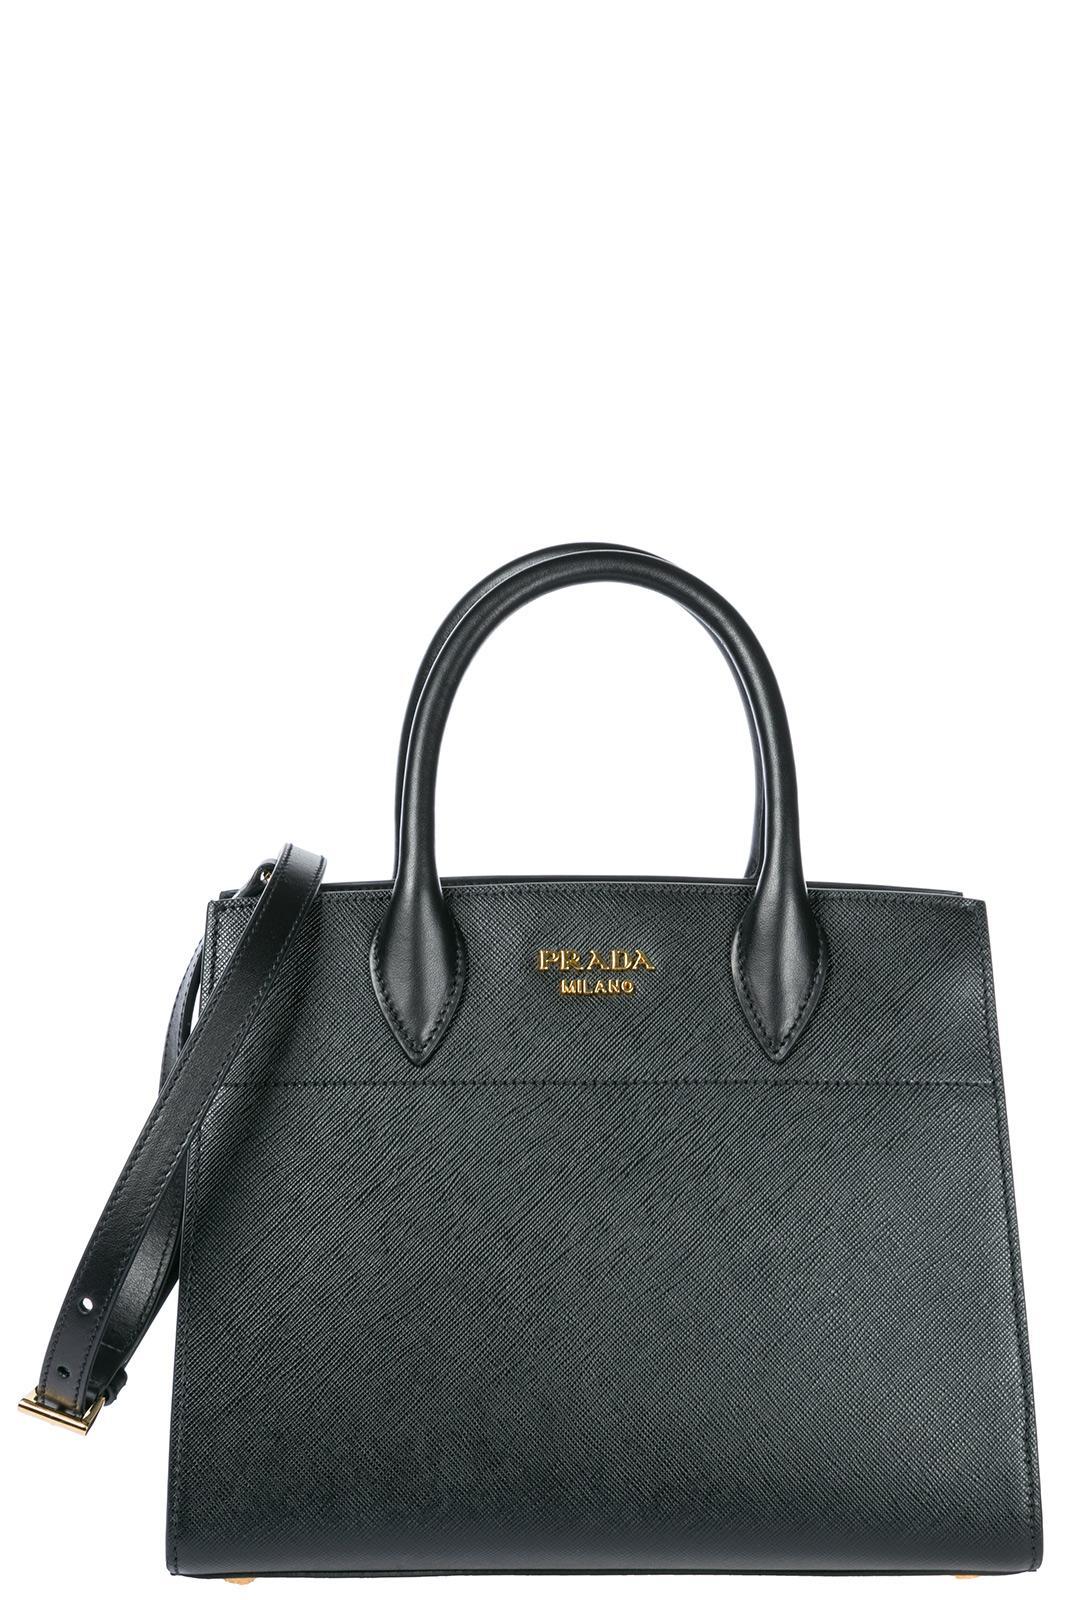 Prada Women's Handbag Cross-body Messenger Bag Purse In Black